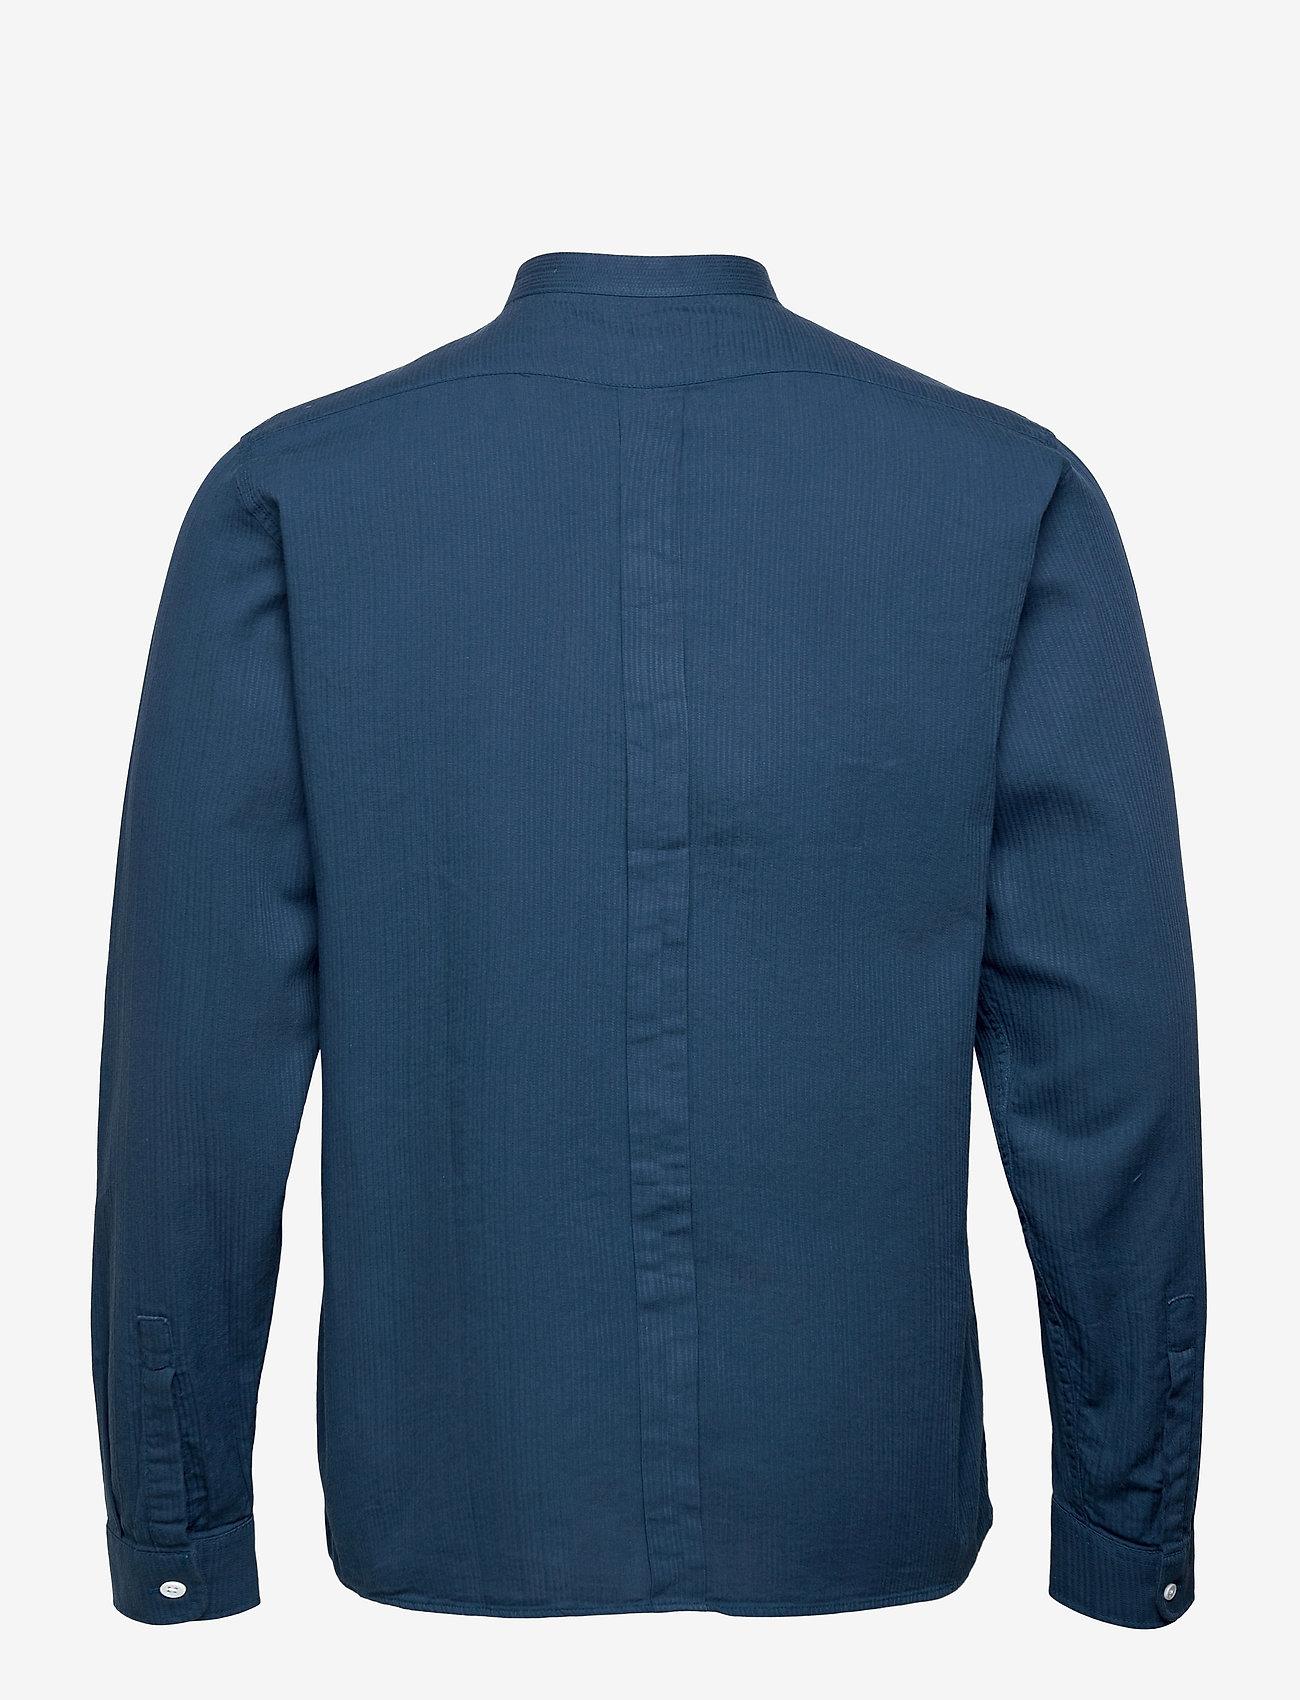 Far Afield - Twombly L/S Shirt - Textured Stripe - linnen overhemden - ensign blue - 1